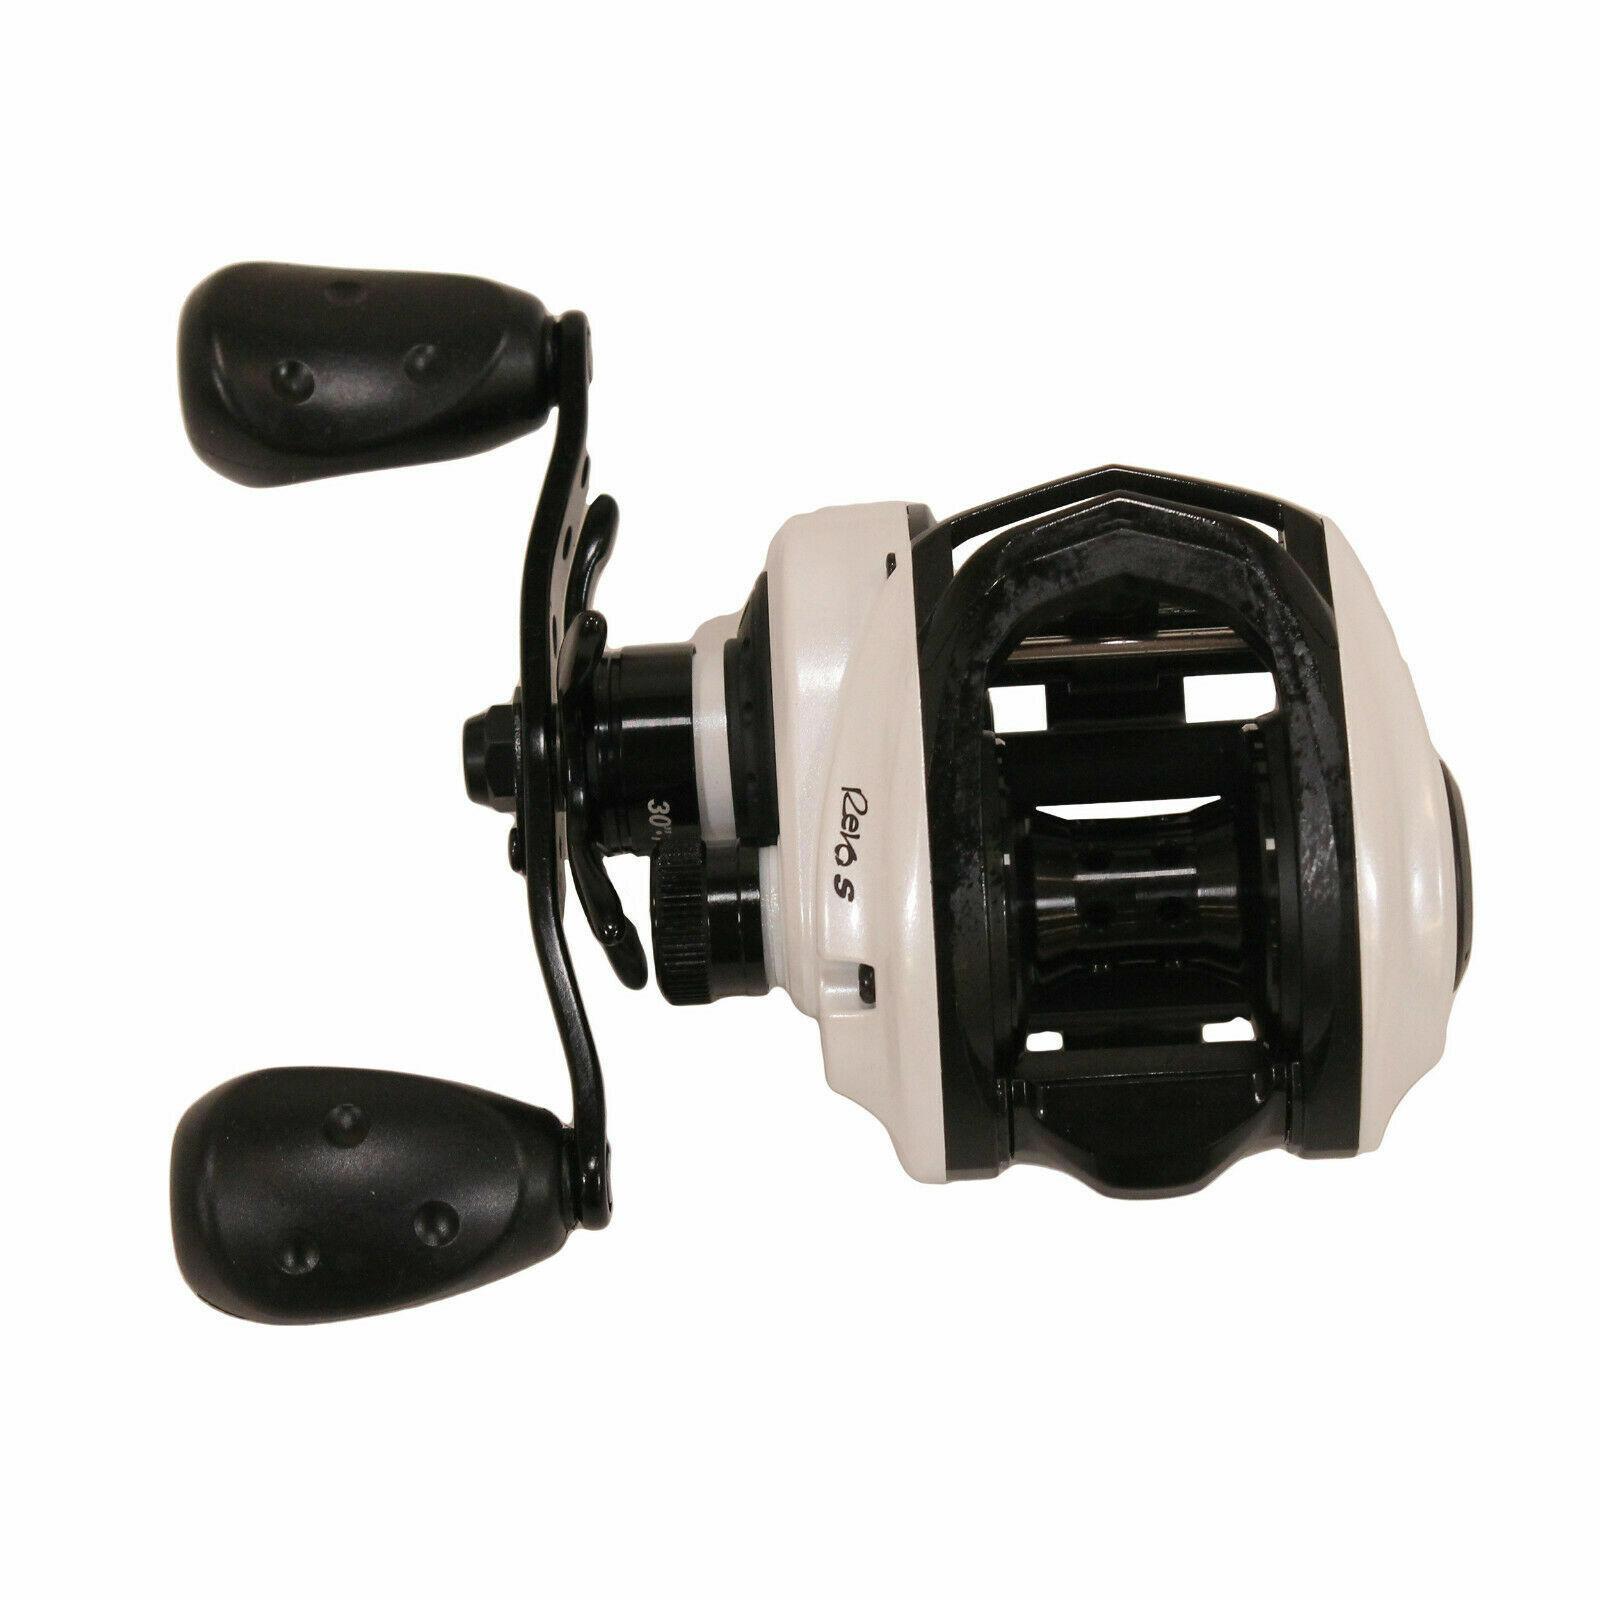 Abu Garcia Revo SX Low Profile Fishing Reel with 7.3:1 Gear Ratio Revo4 SX-HS-L